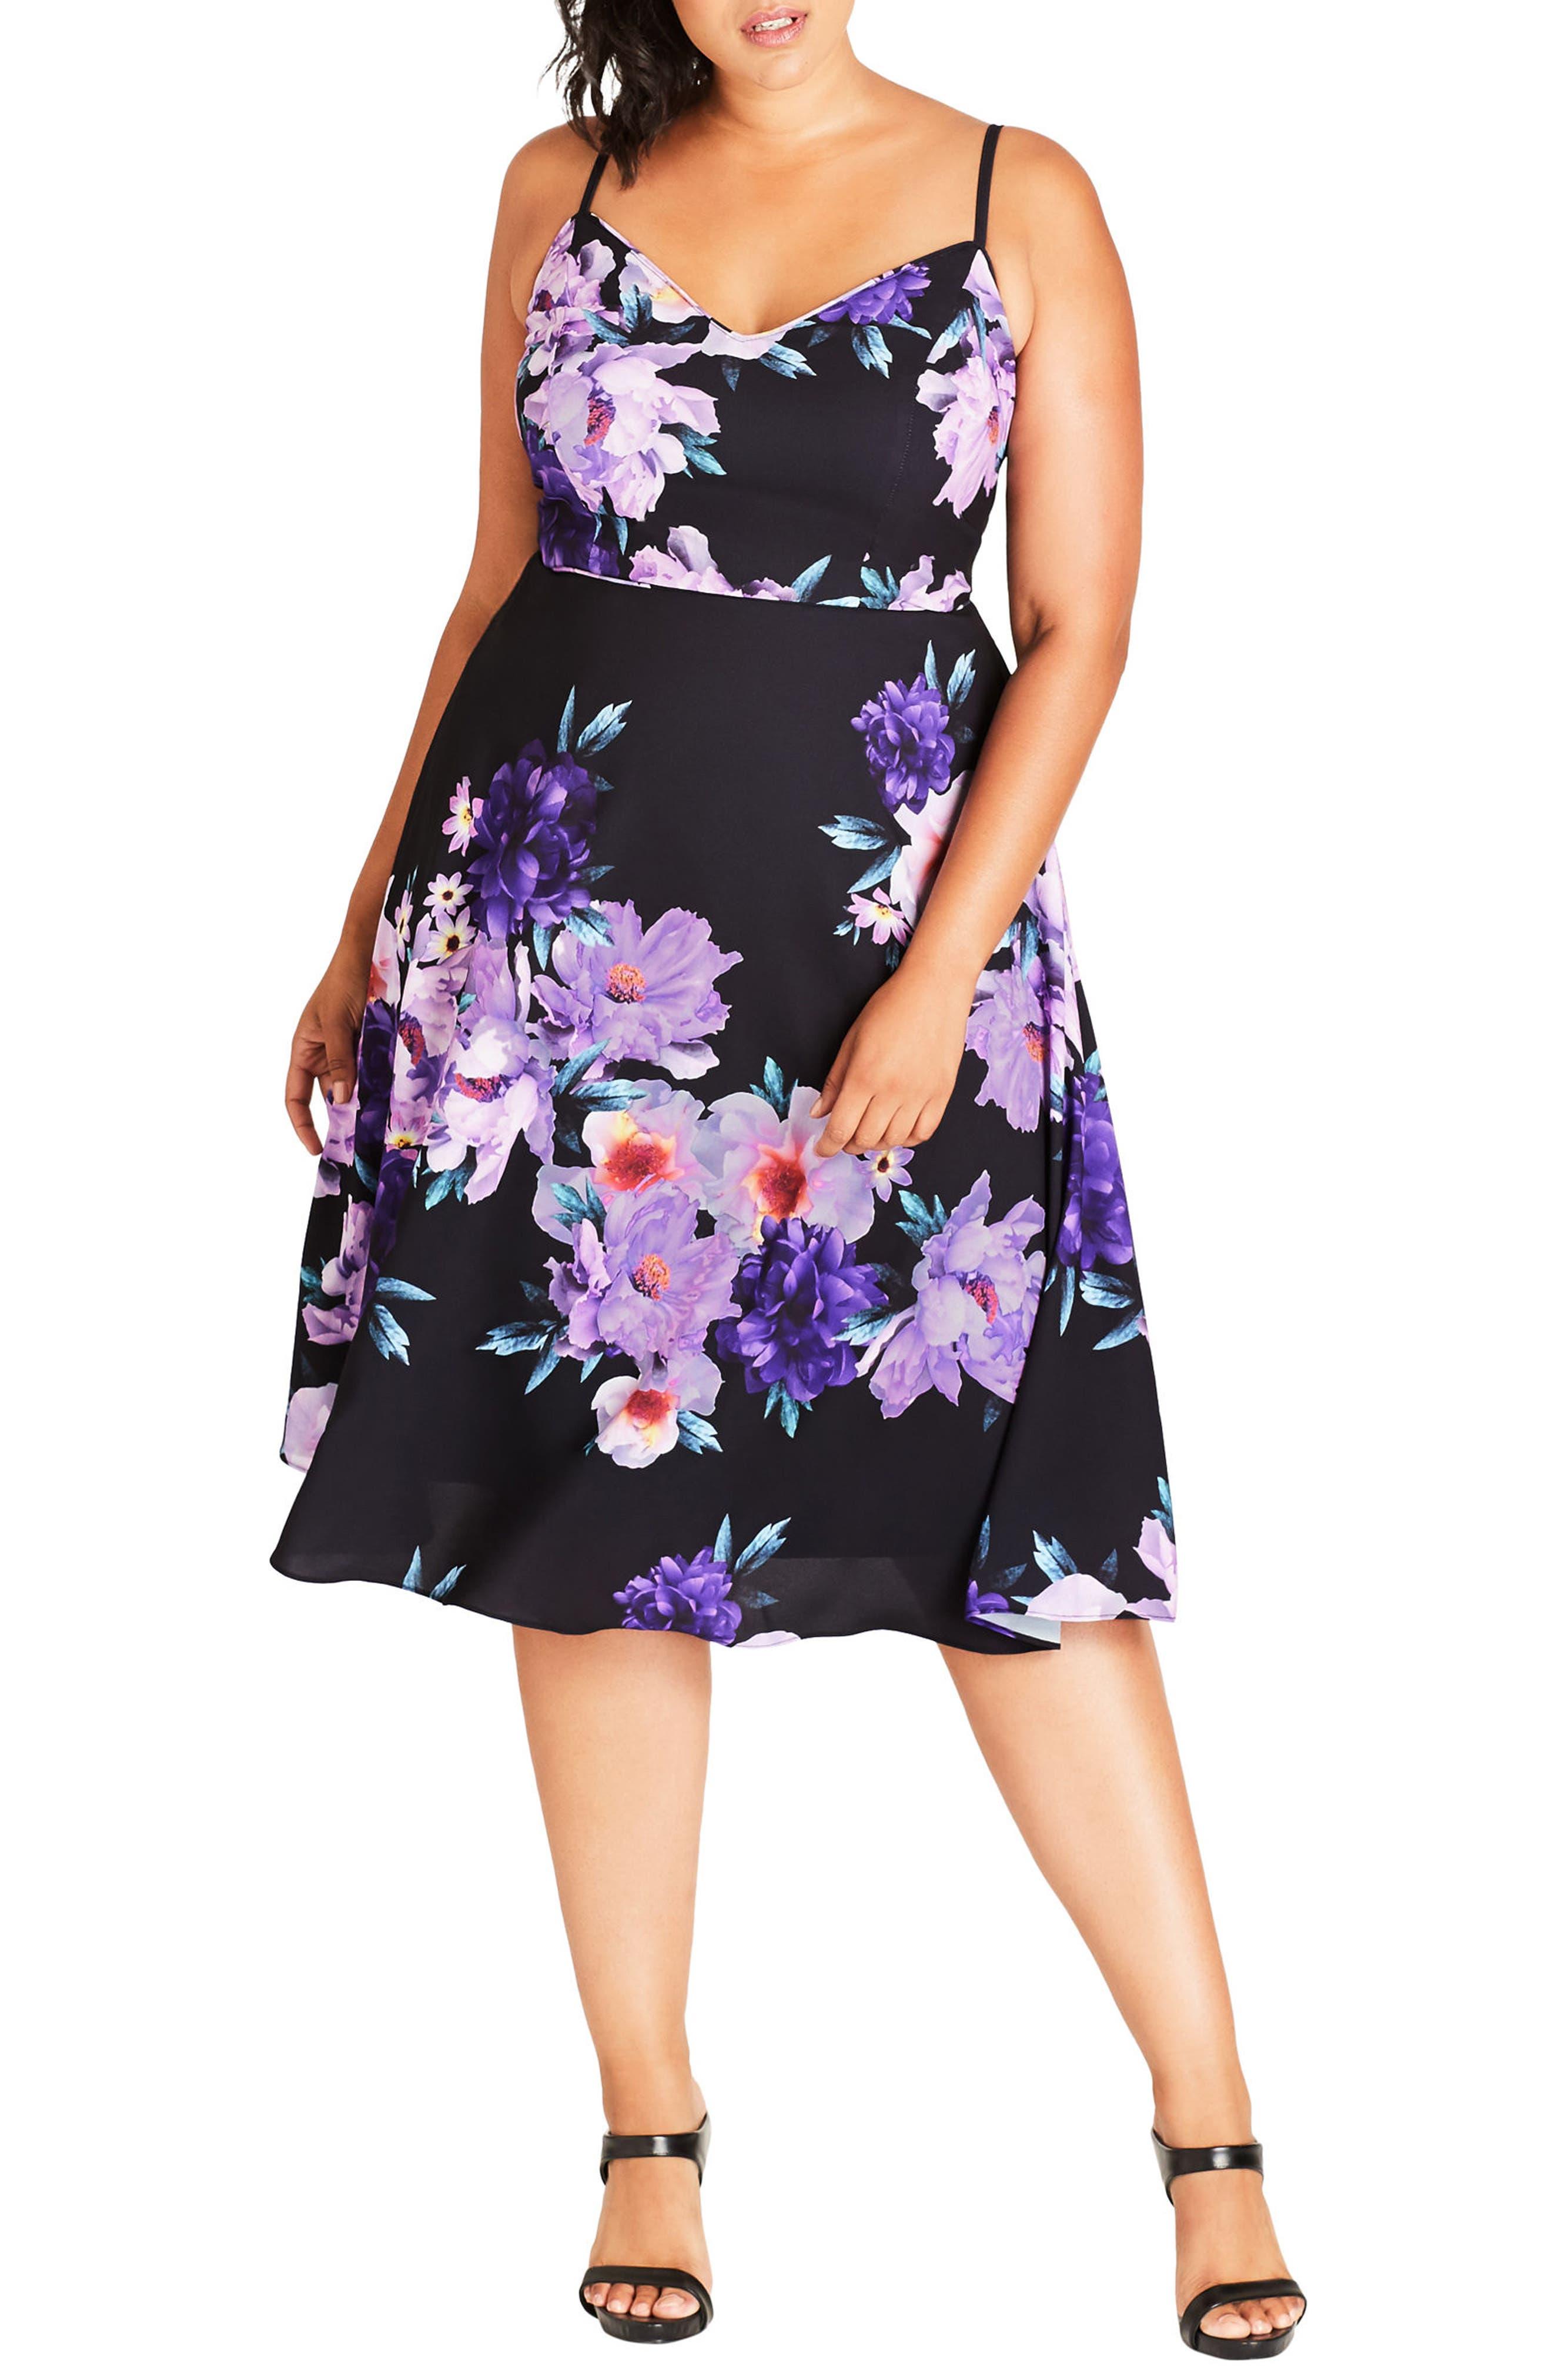 Summer Fling Floral Print Midi Dress,                             Main thumbnail 1, color,                             650